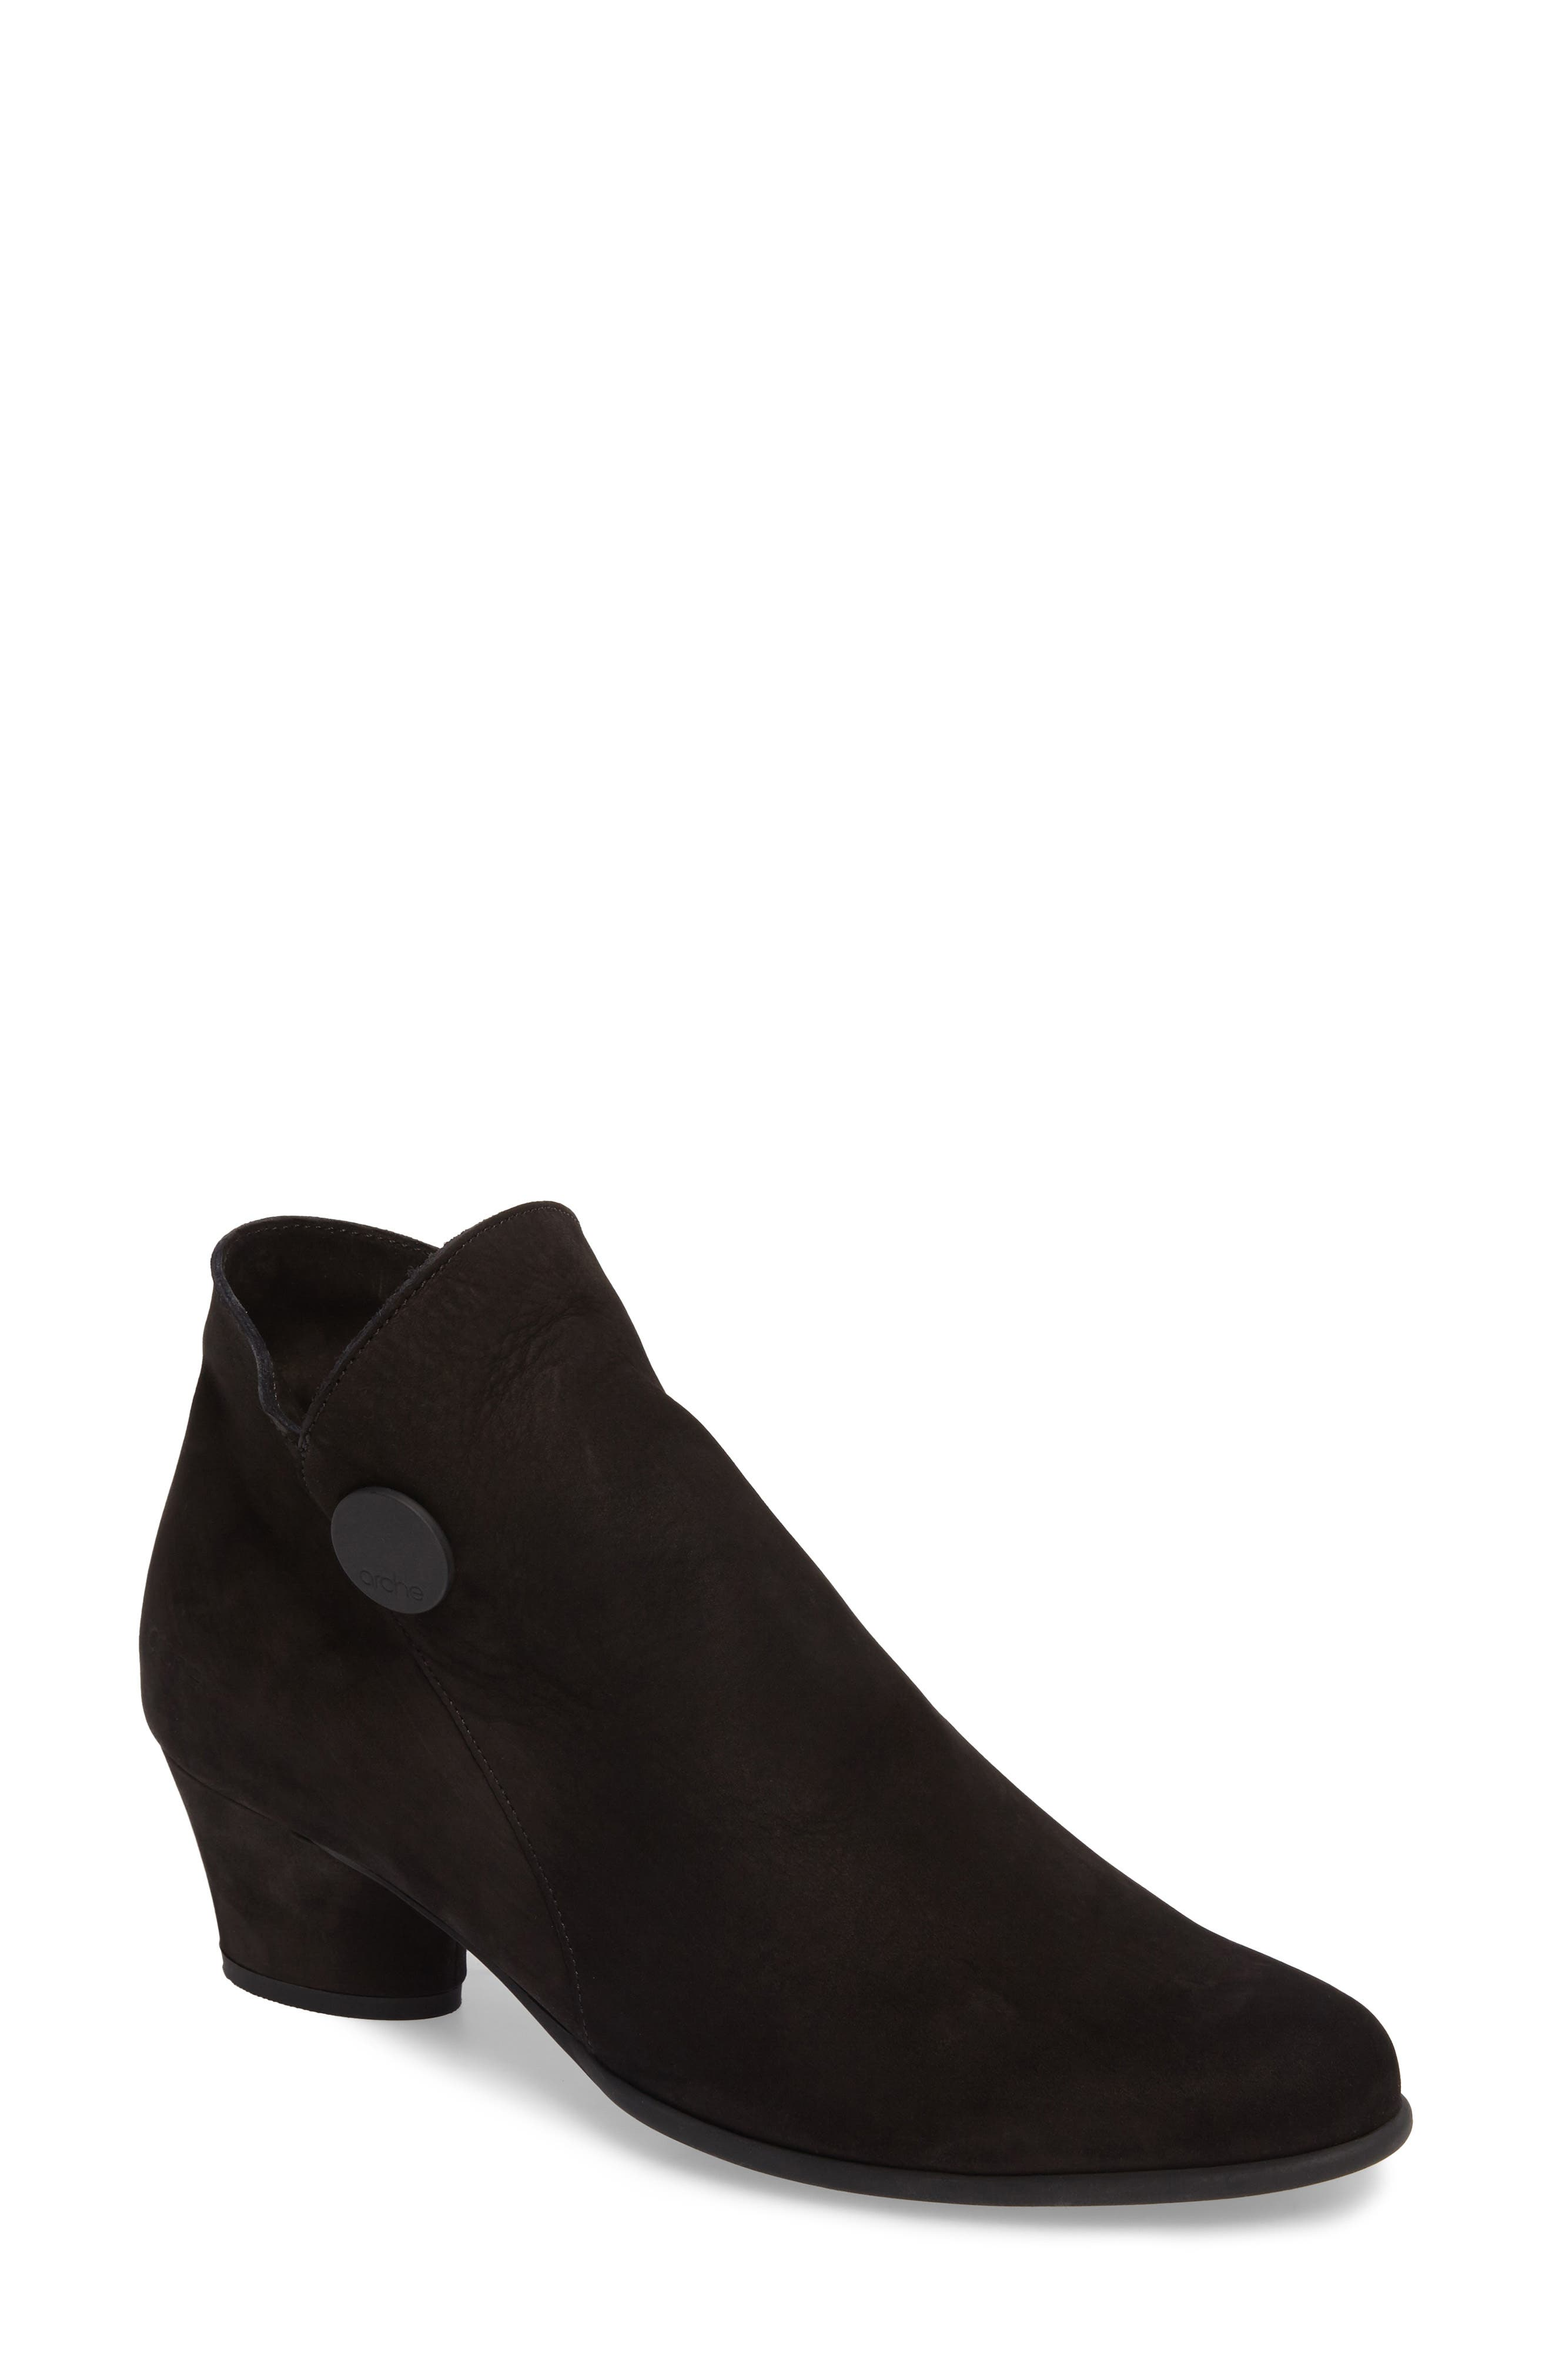 Mussem Water Resistant Bootie,                         Main,                         color, Noir Nubuck Leather